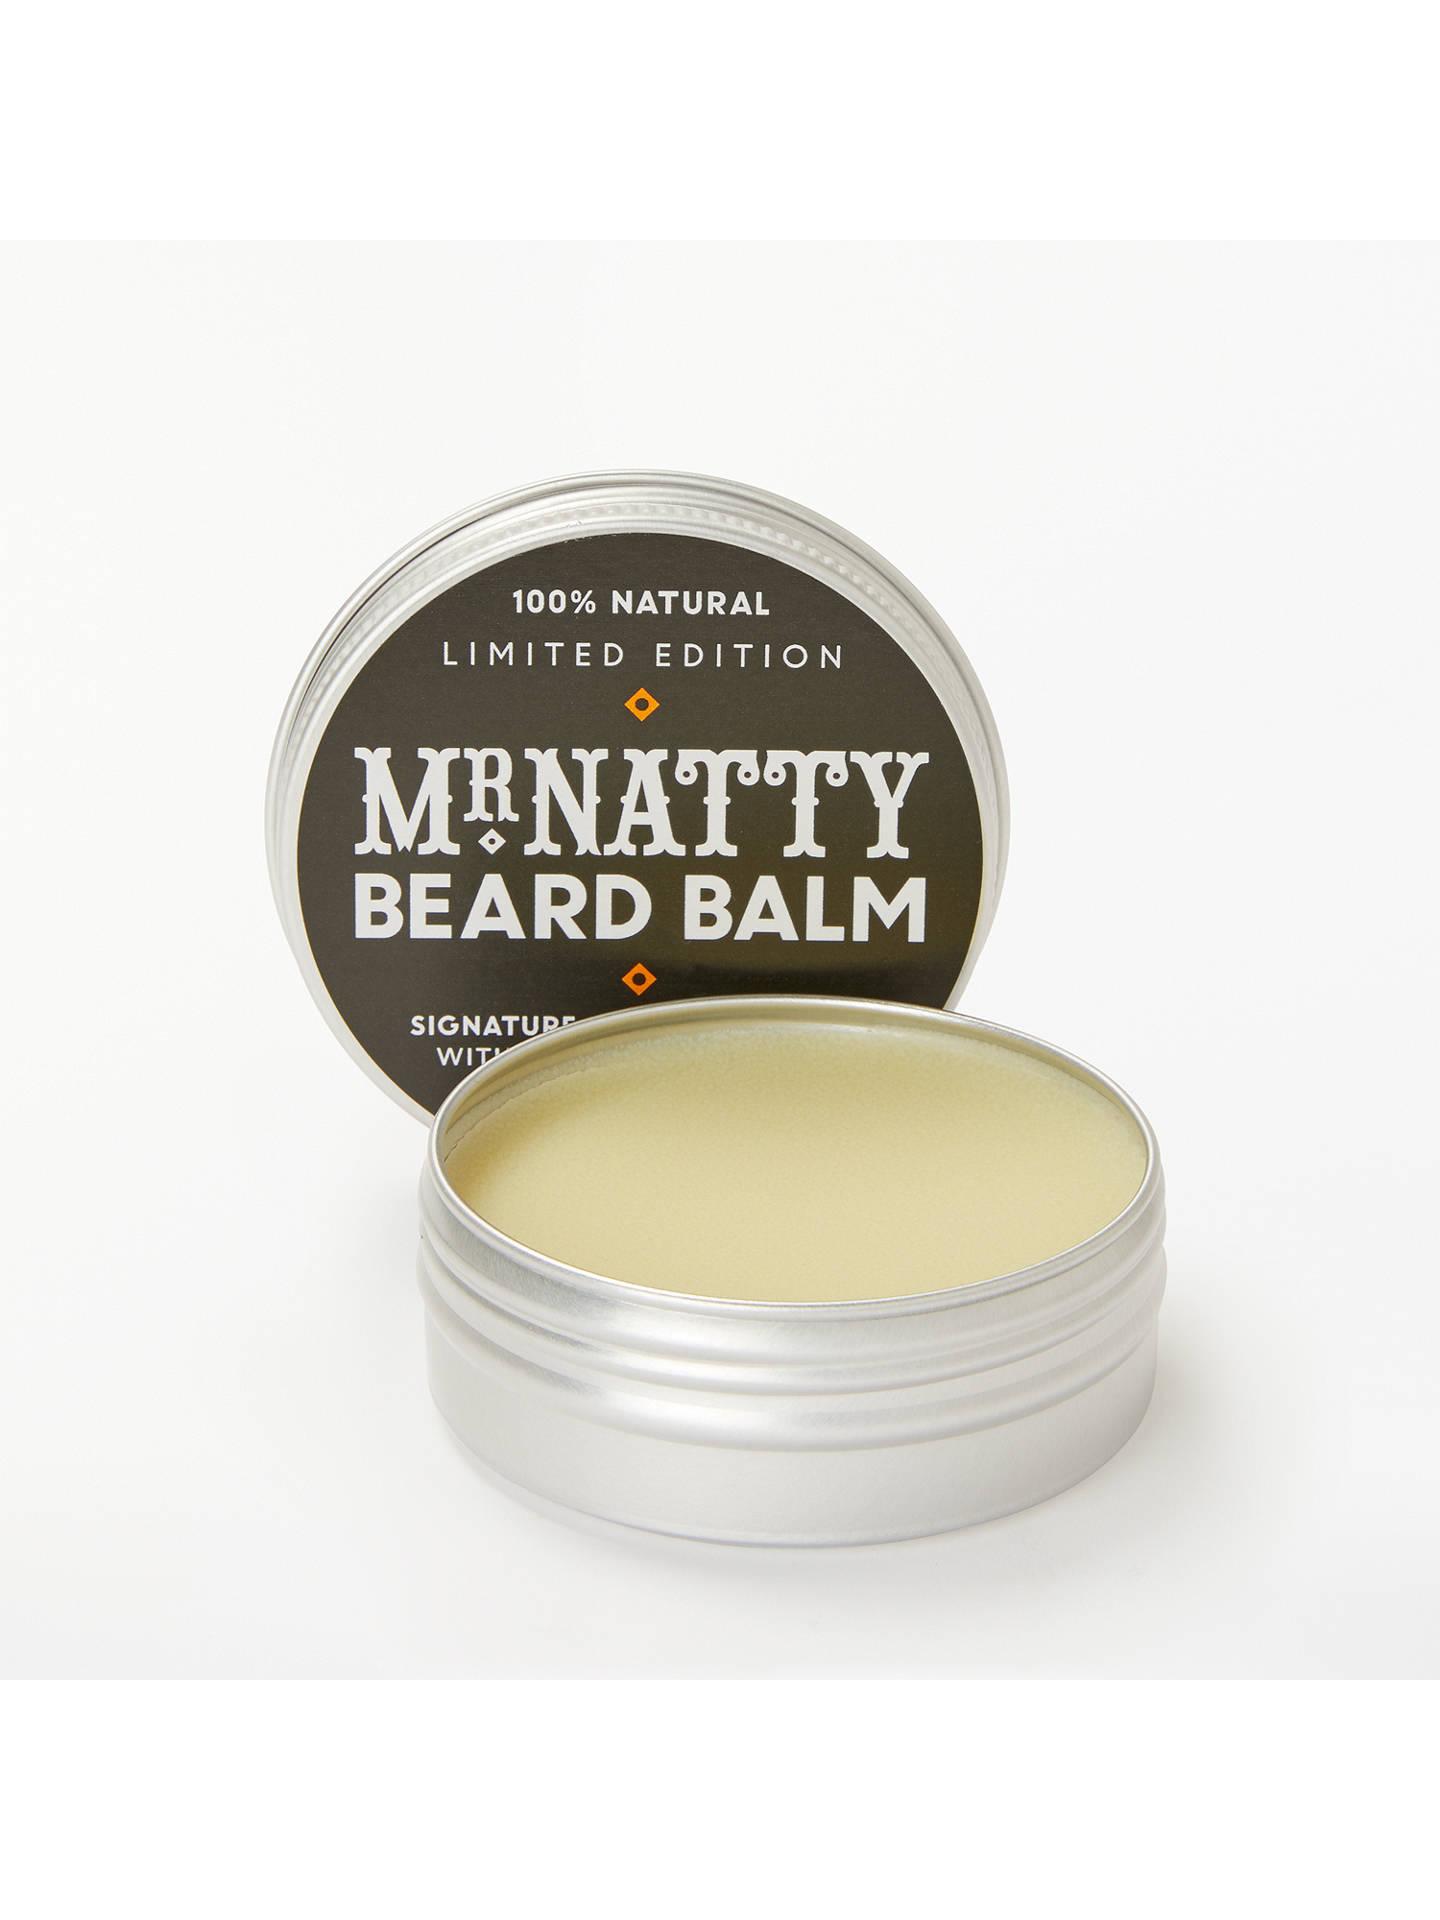 Mr Natty Limited Edition Beard Balm